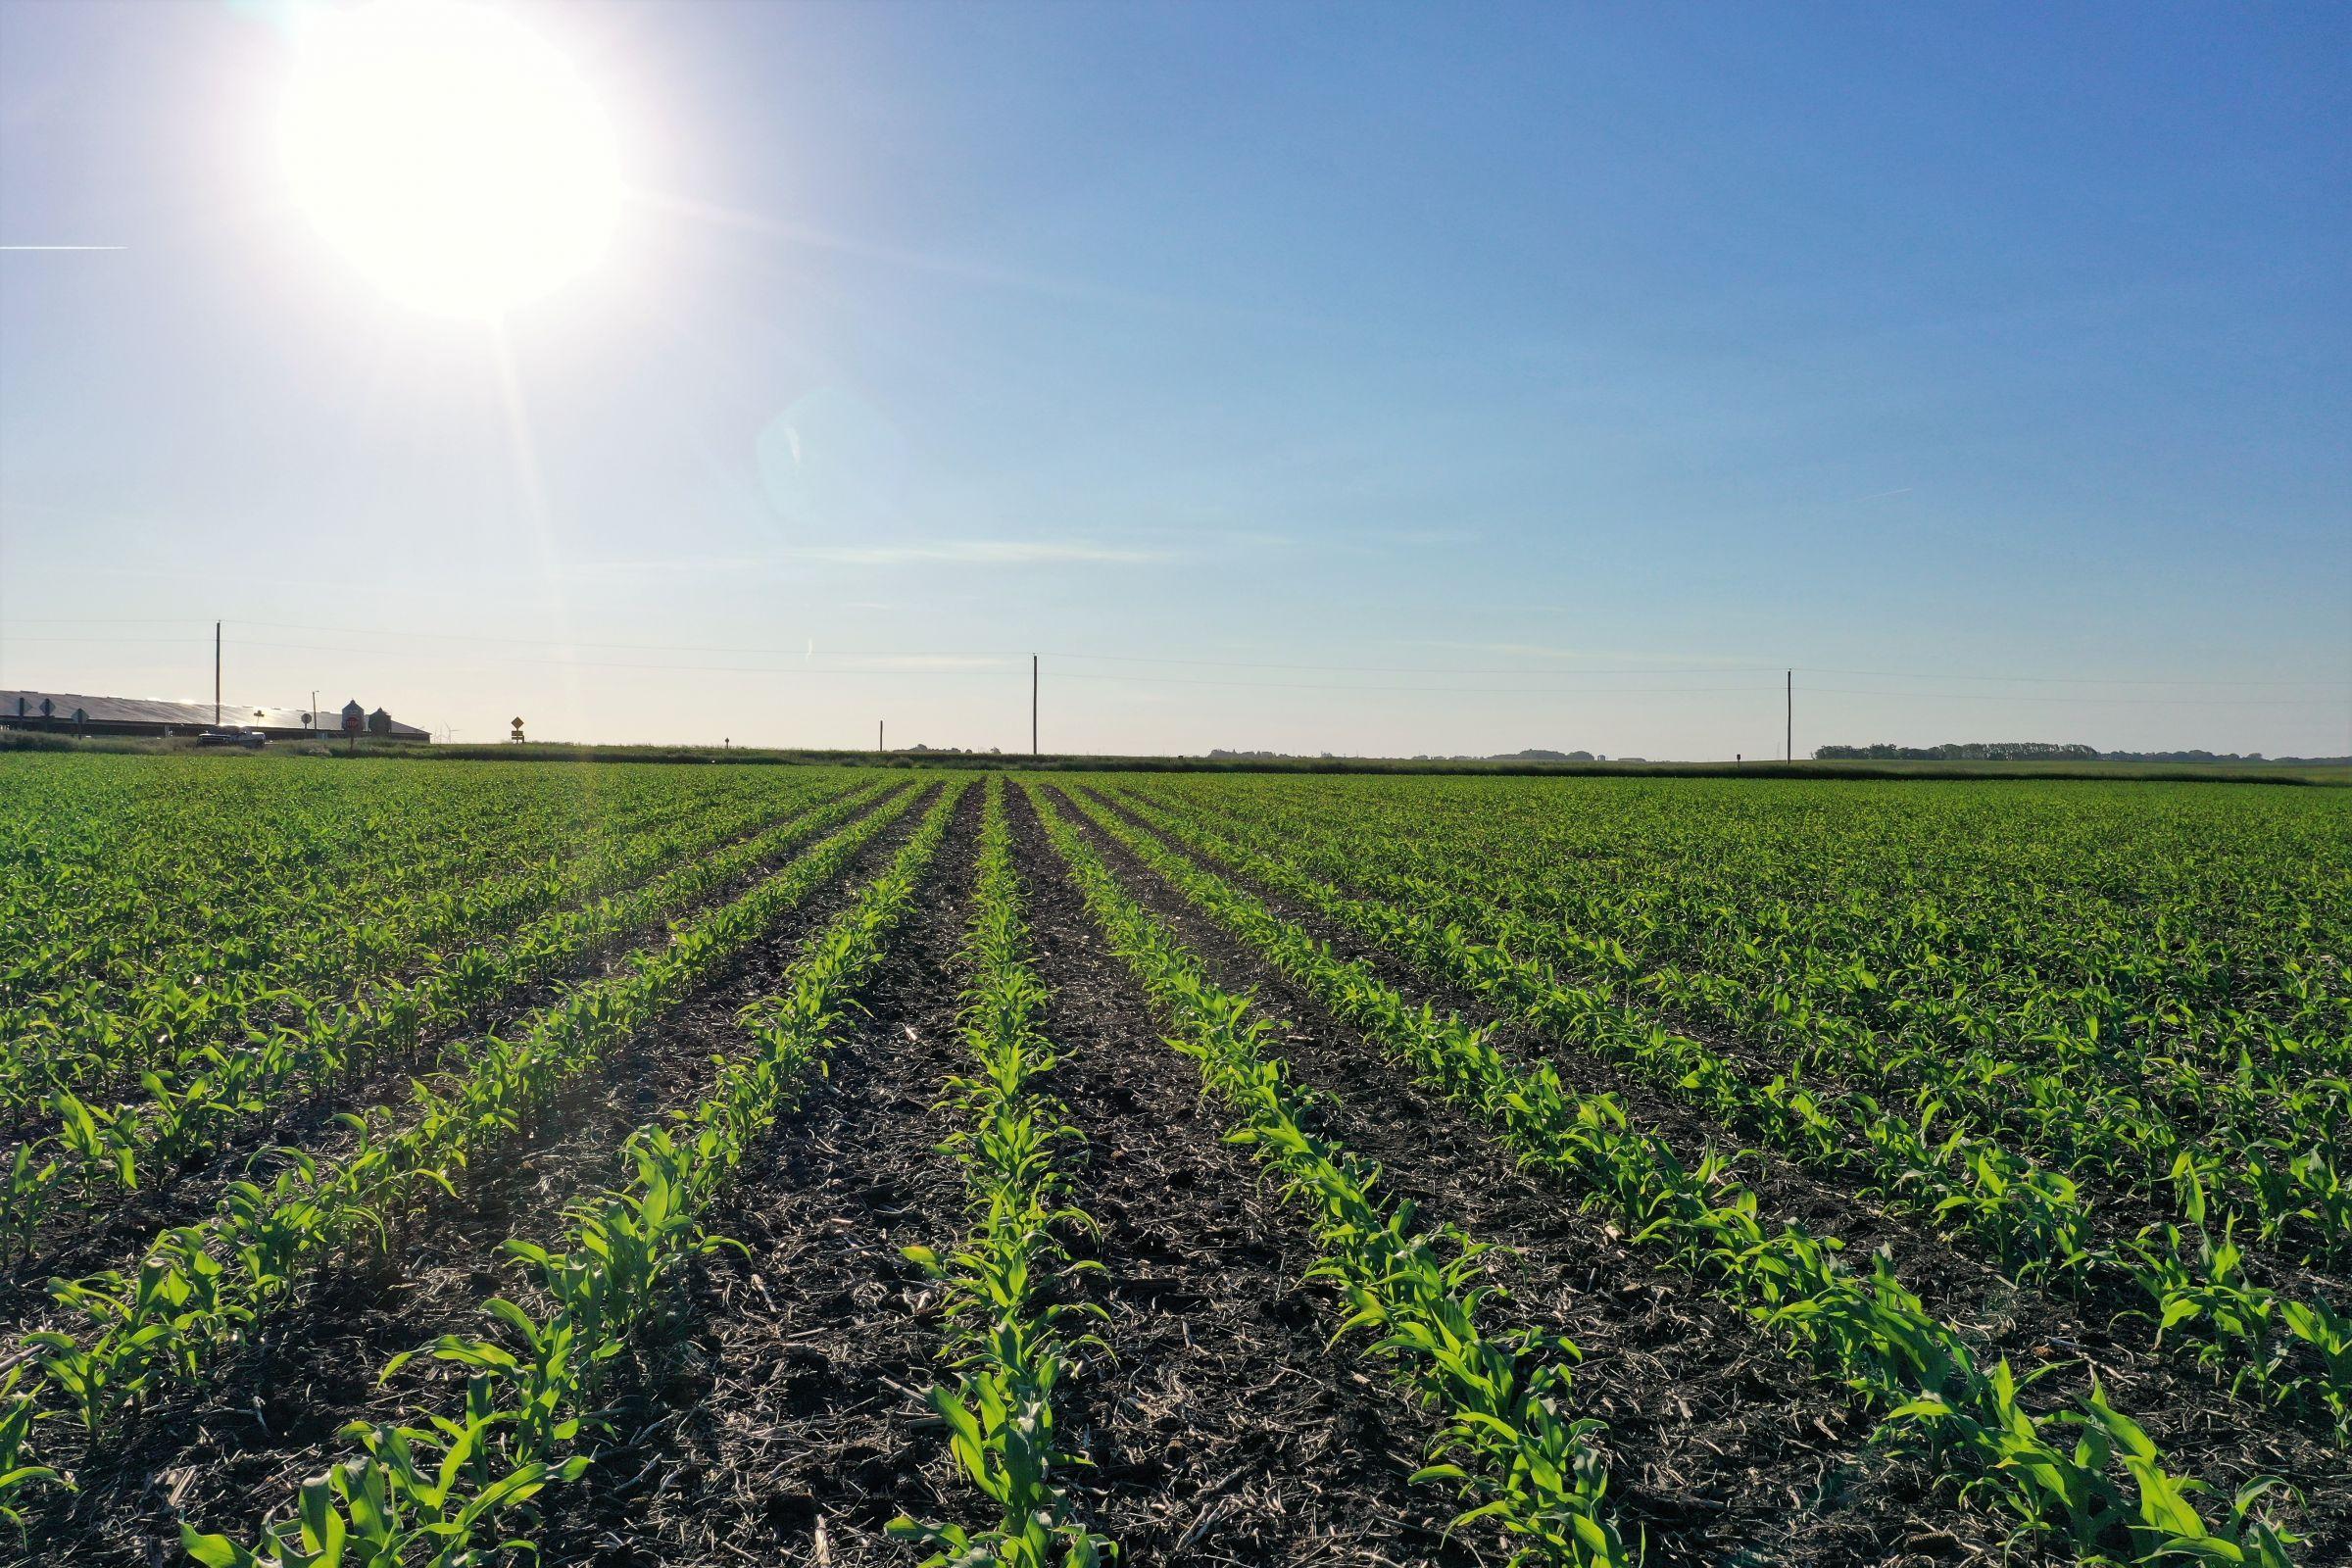 land-calhoun-county-iowa-80-acres-listing-number-15571-0-2021-06-09-140313.JPG